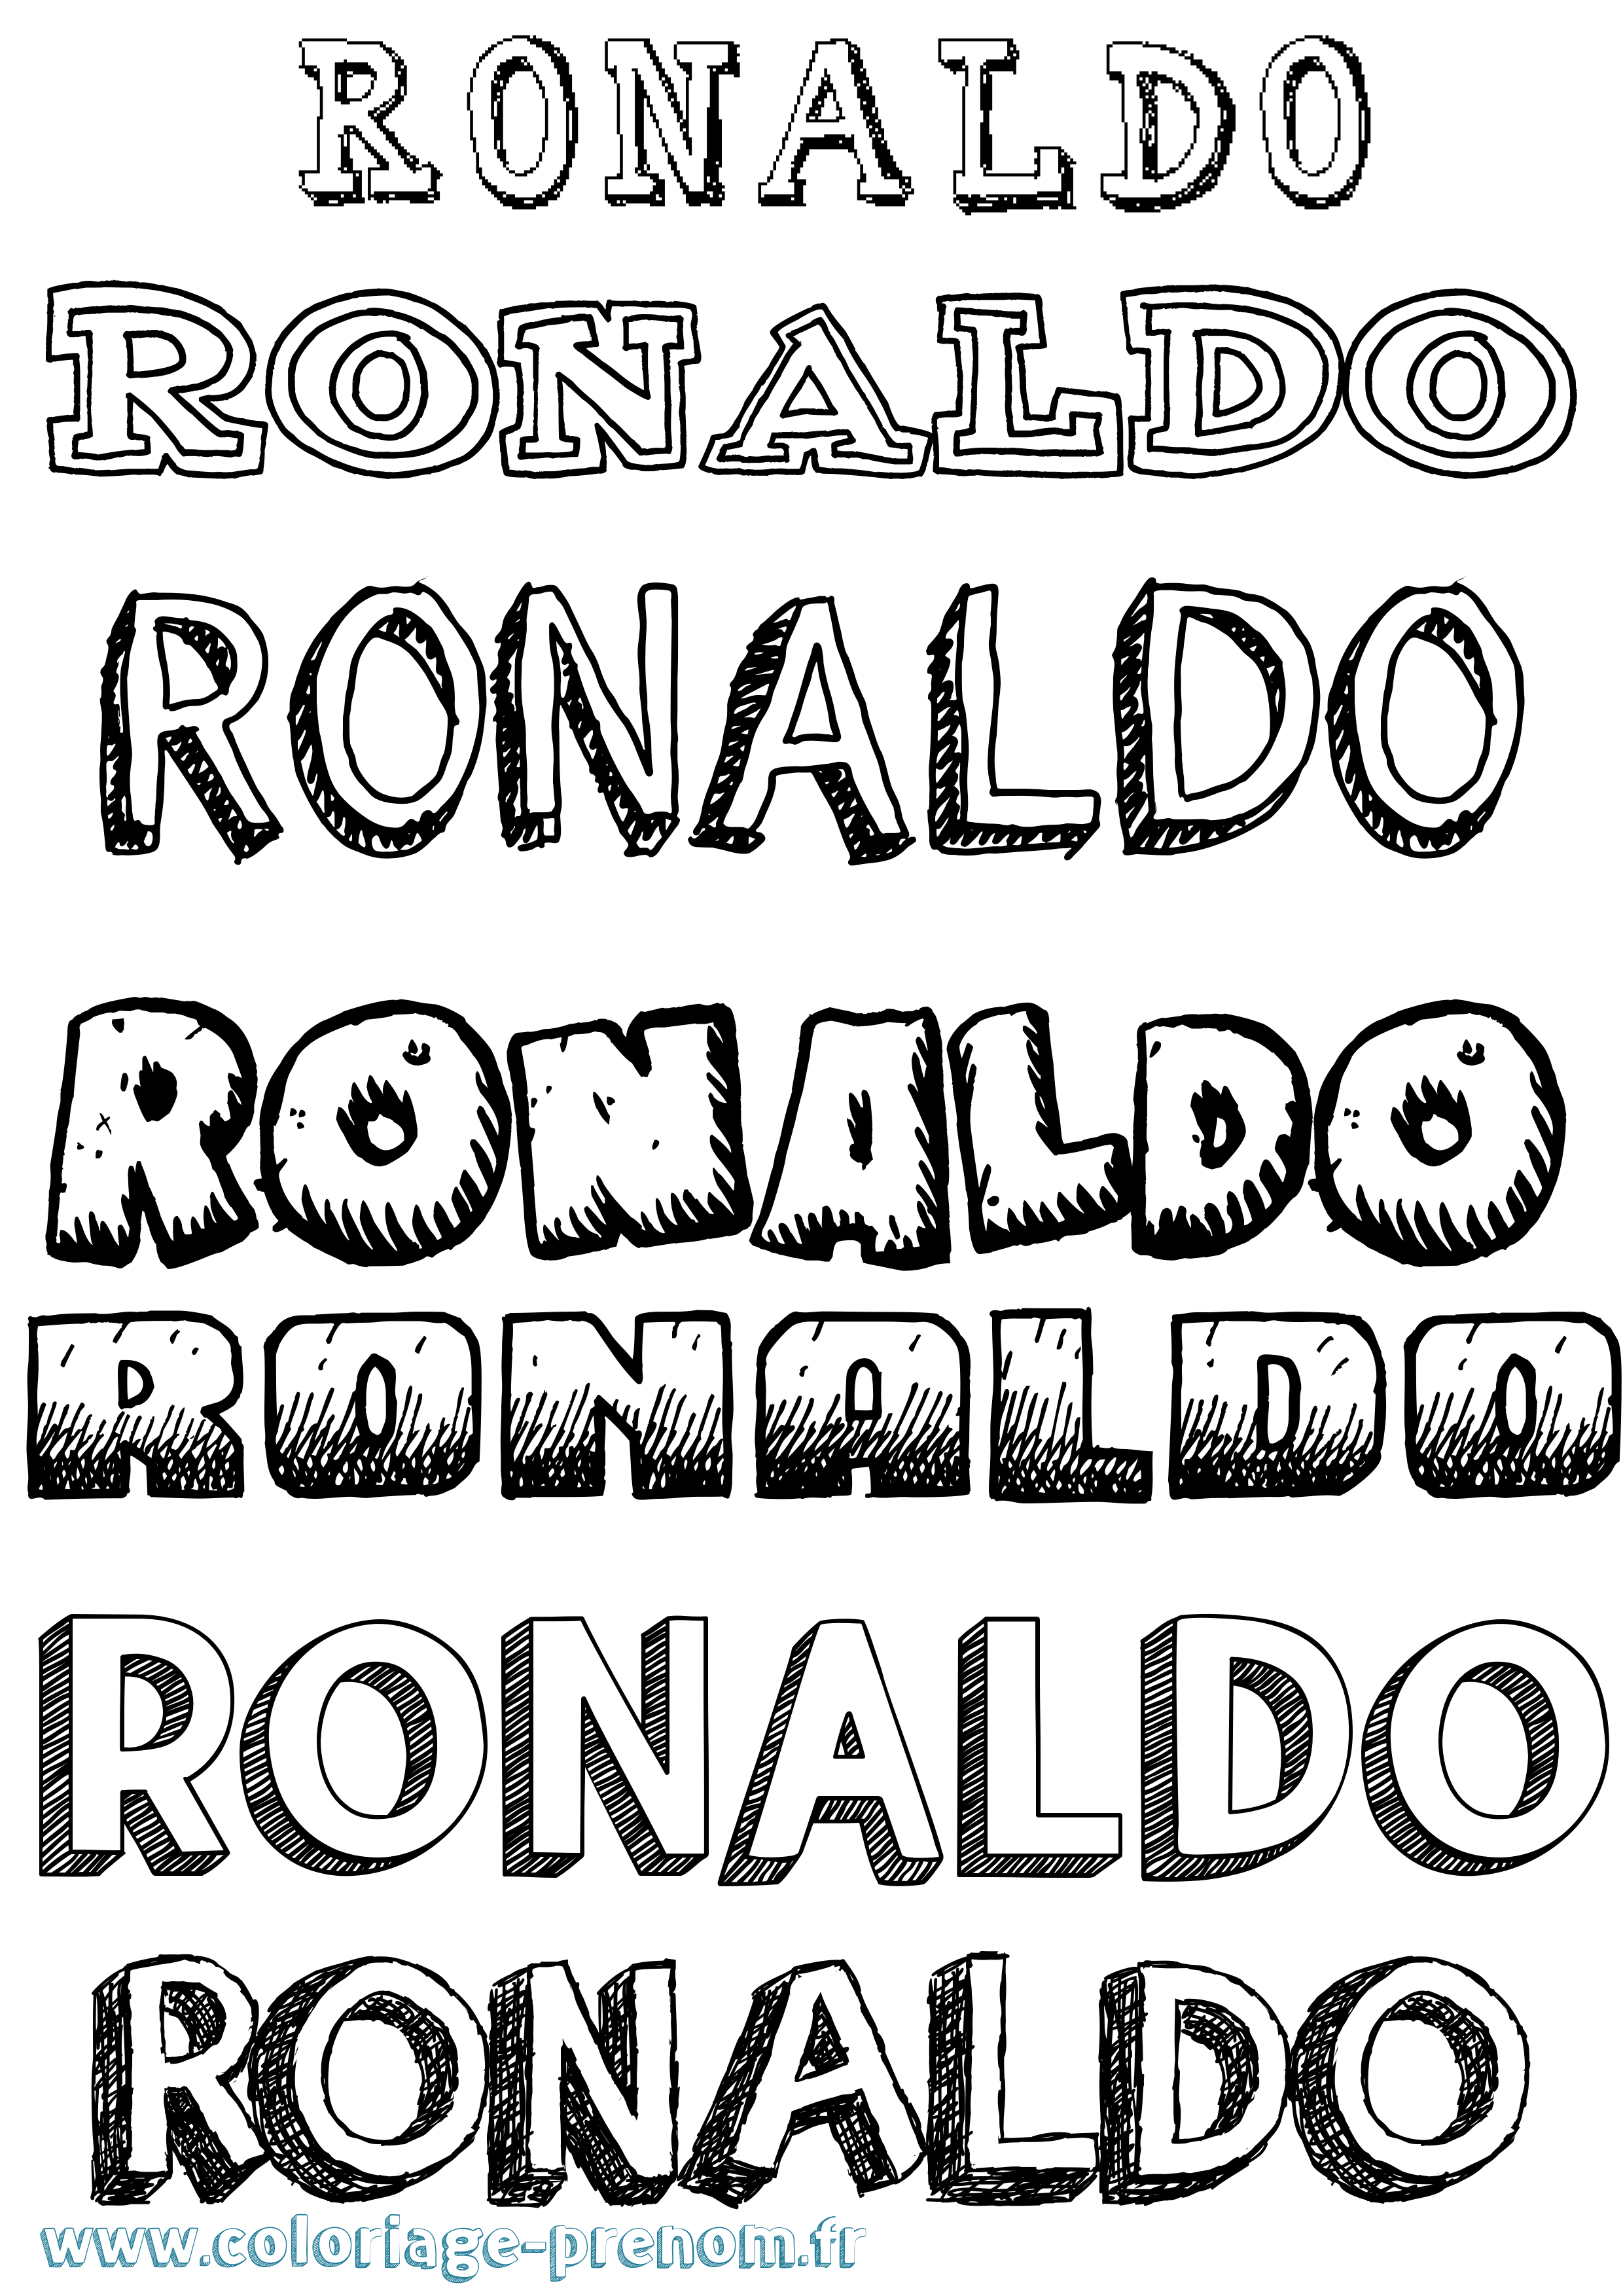 Coloriage Gratuit Ronaldo.Coloriage De Ronaldo Coloriages Cristiano Ronaldo Cr7